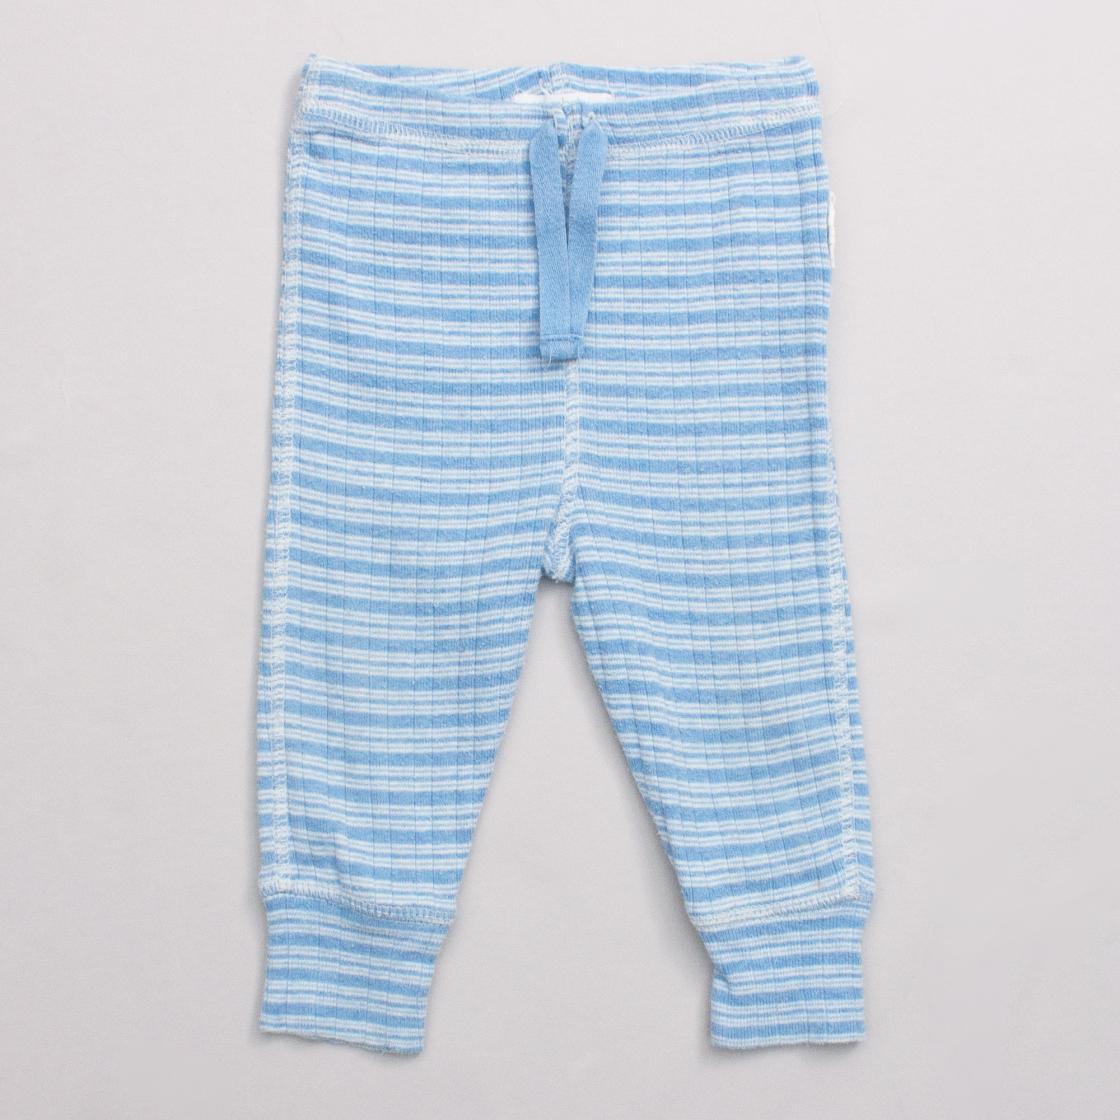 Purebaby Striped Leggings